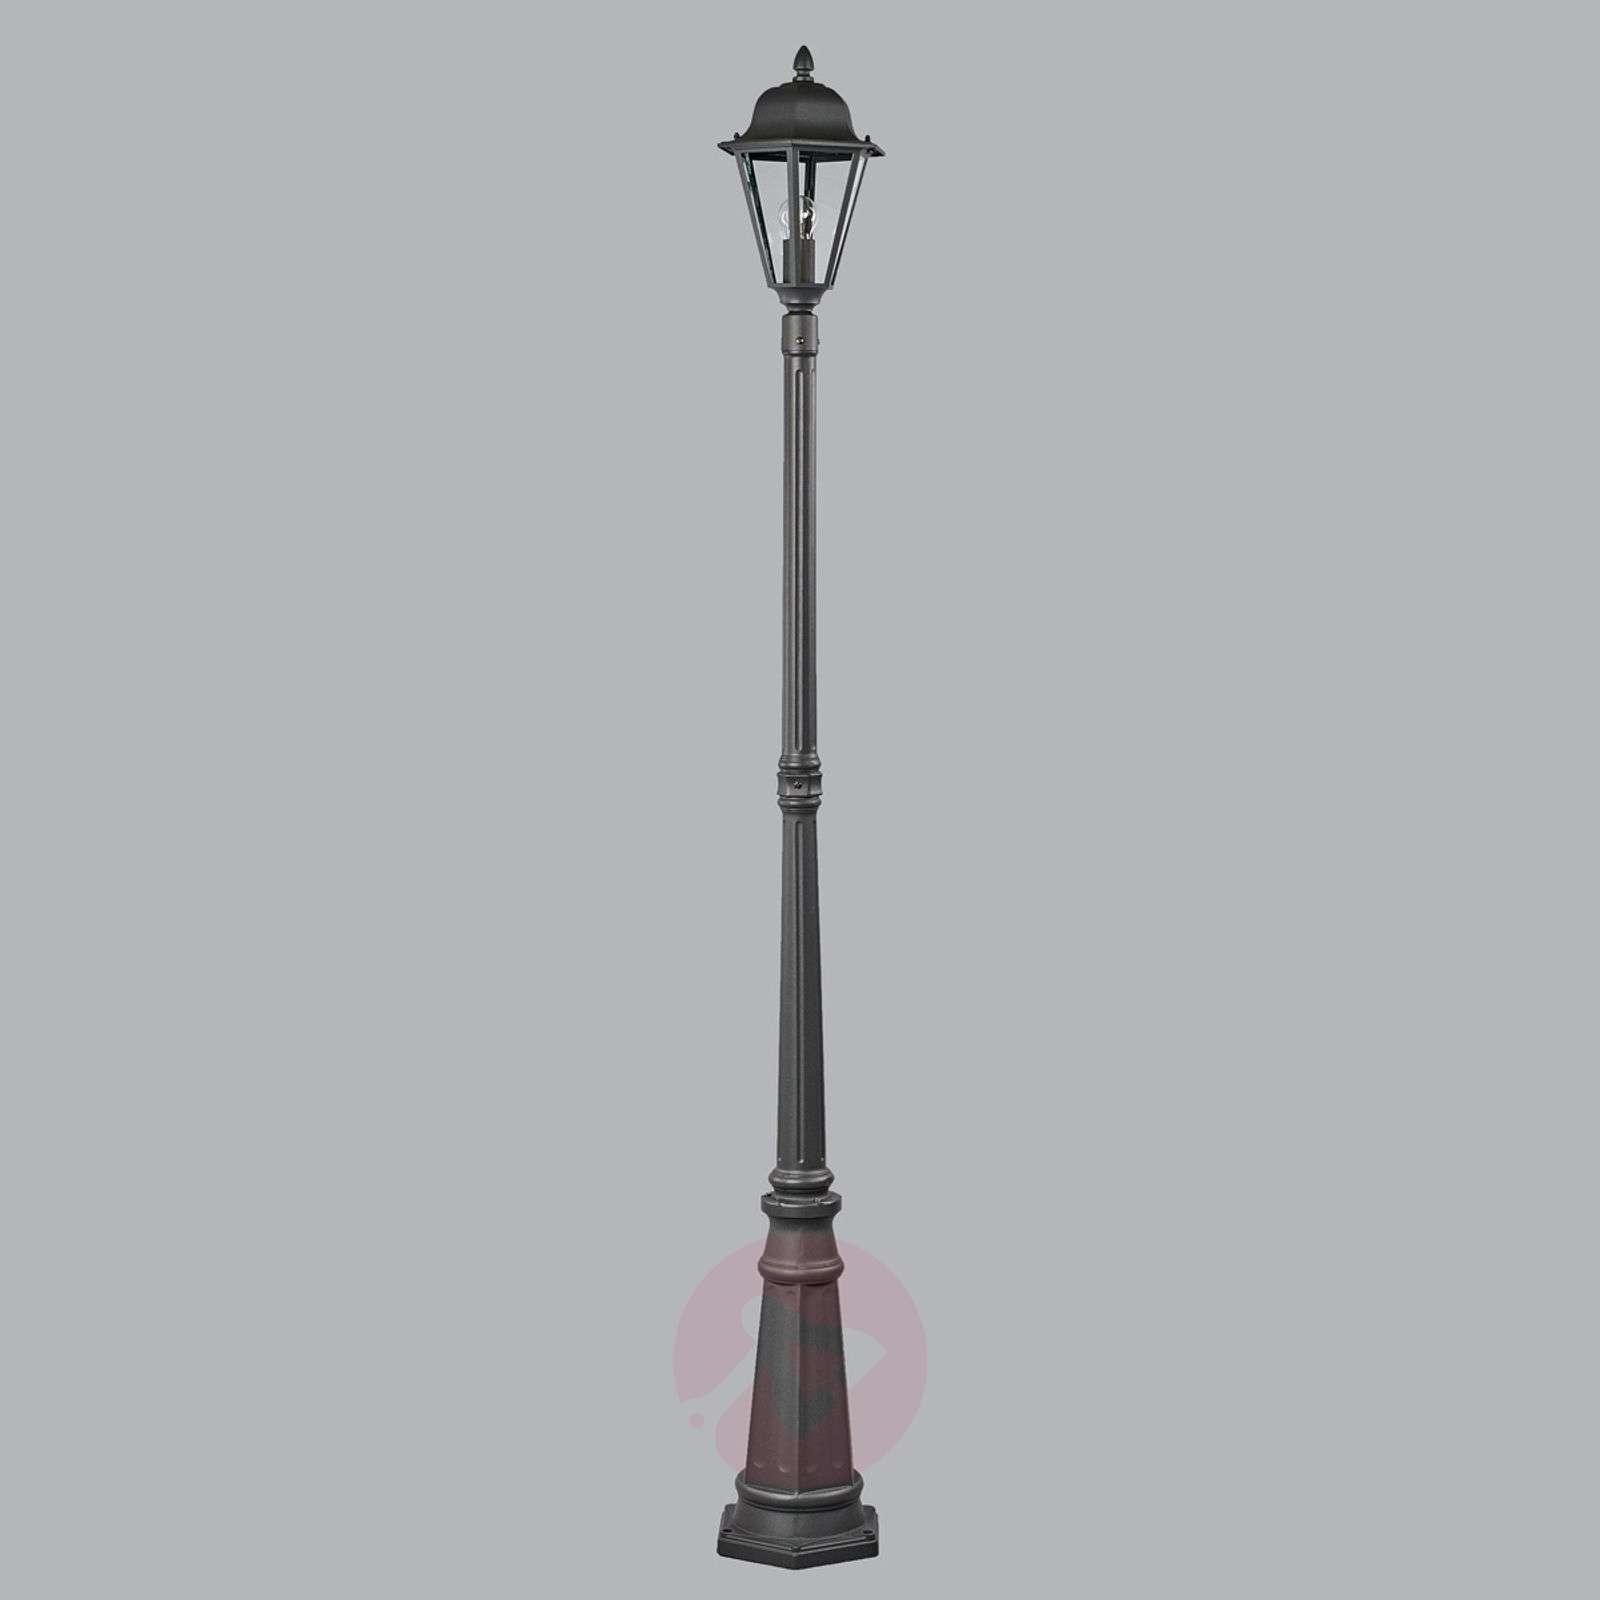 Post light Edana in graphite grey-9630065-01